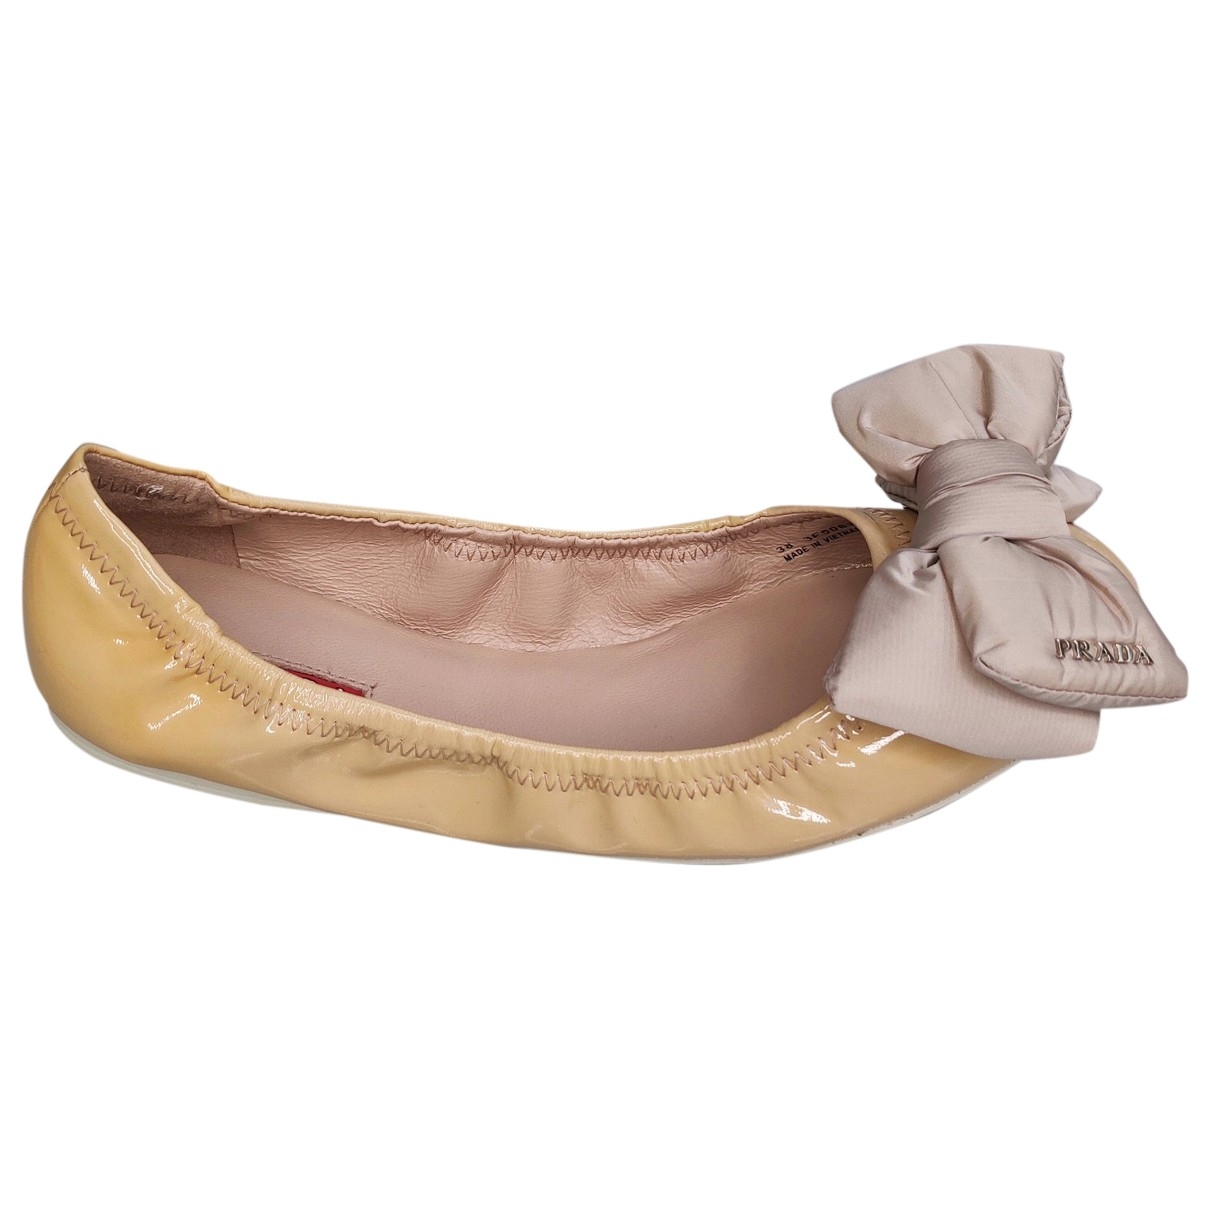 Prada - Ballerines   pour femme en cuir verni - beige